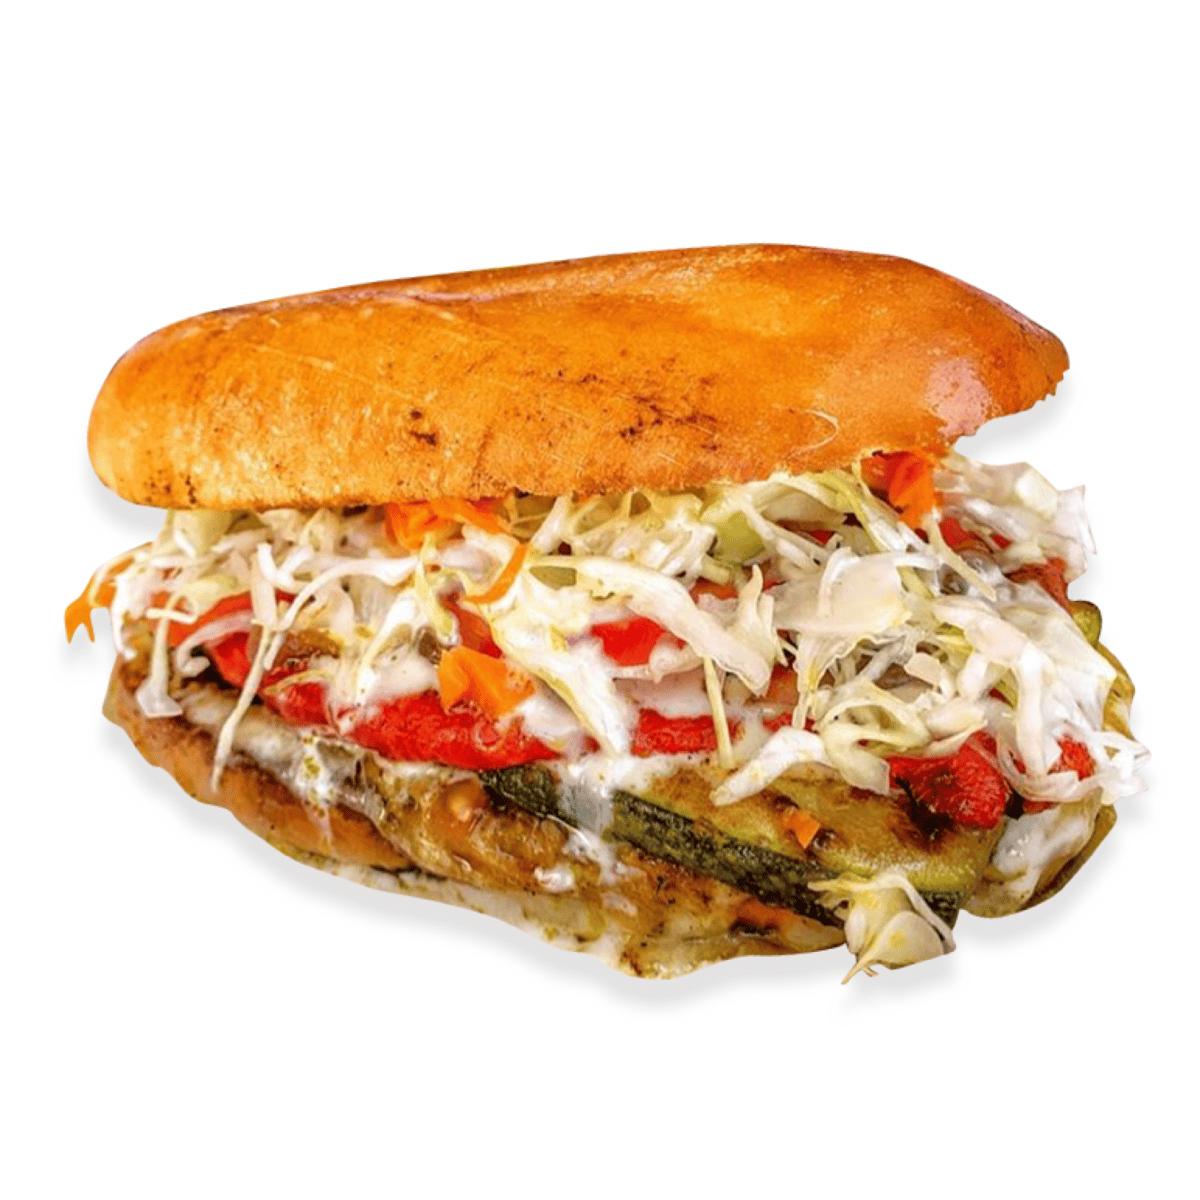 16A. Vegan Roasted & Grilled Veggies (Big Torta Only)